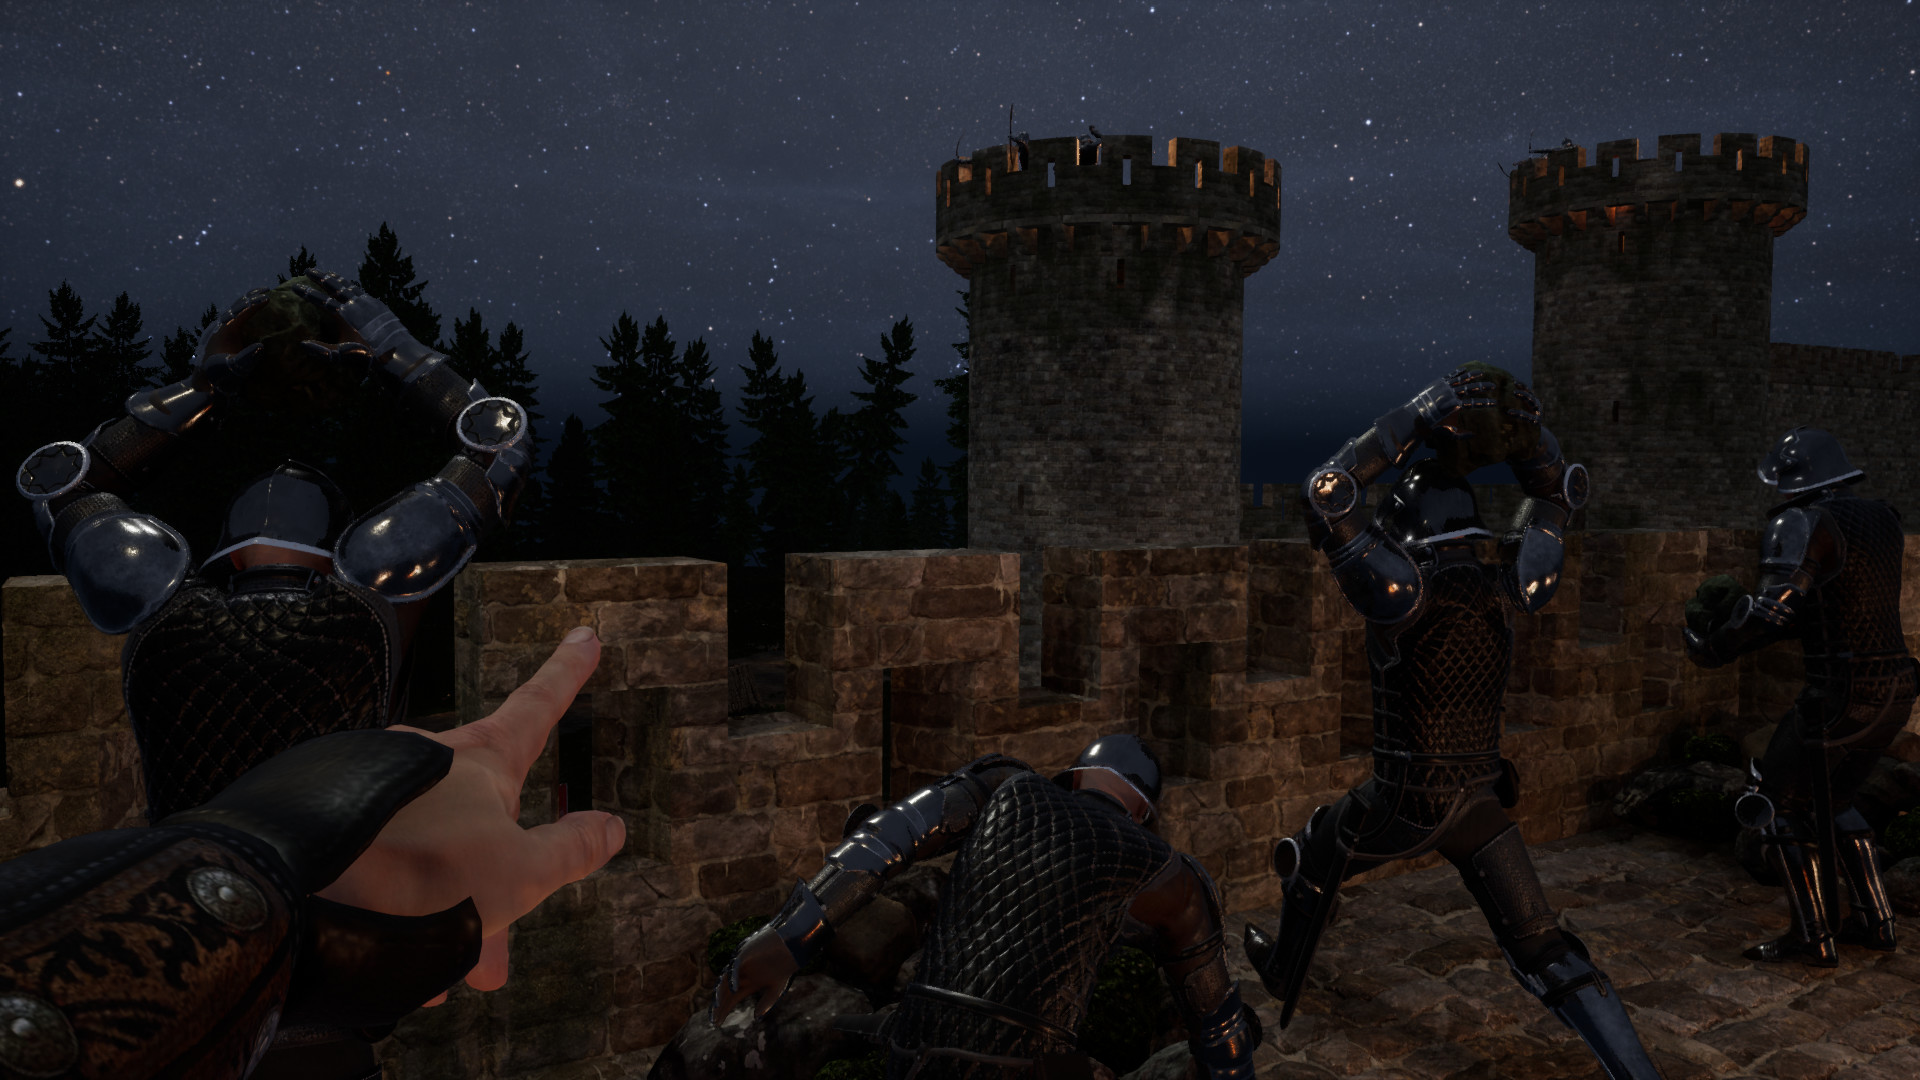 Анонсирован Noble's Life: Kingdom Reborn — симулятор французского аристократа времен Столетней войны